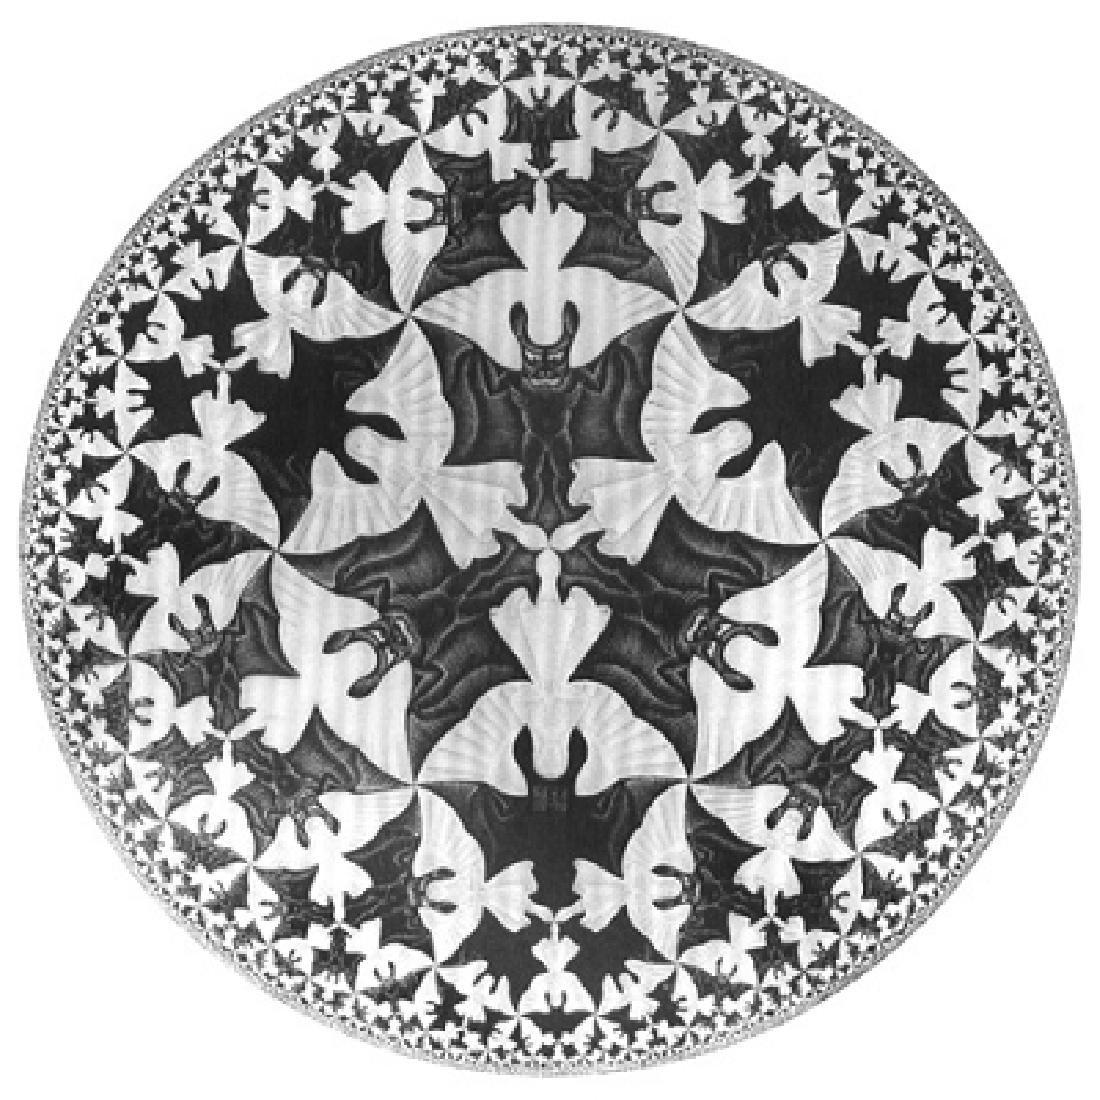 After Maurits Escher: Sphere Angels & Devils Statue - 3